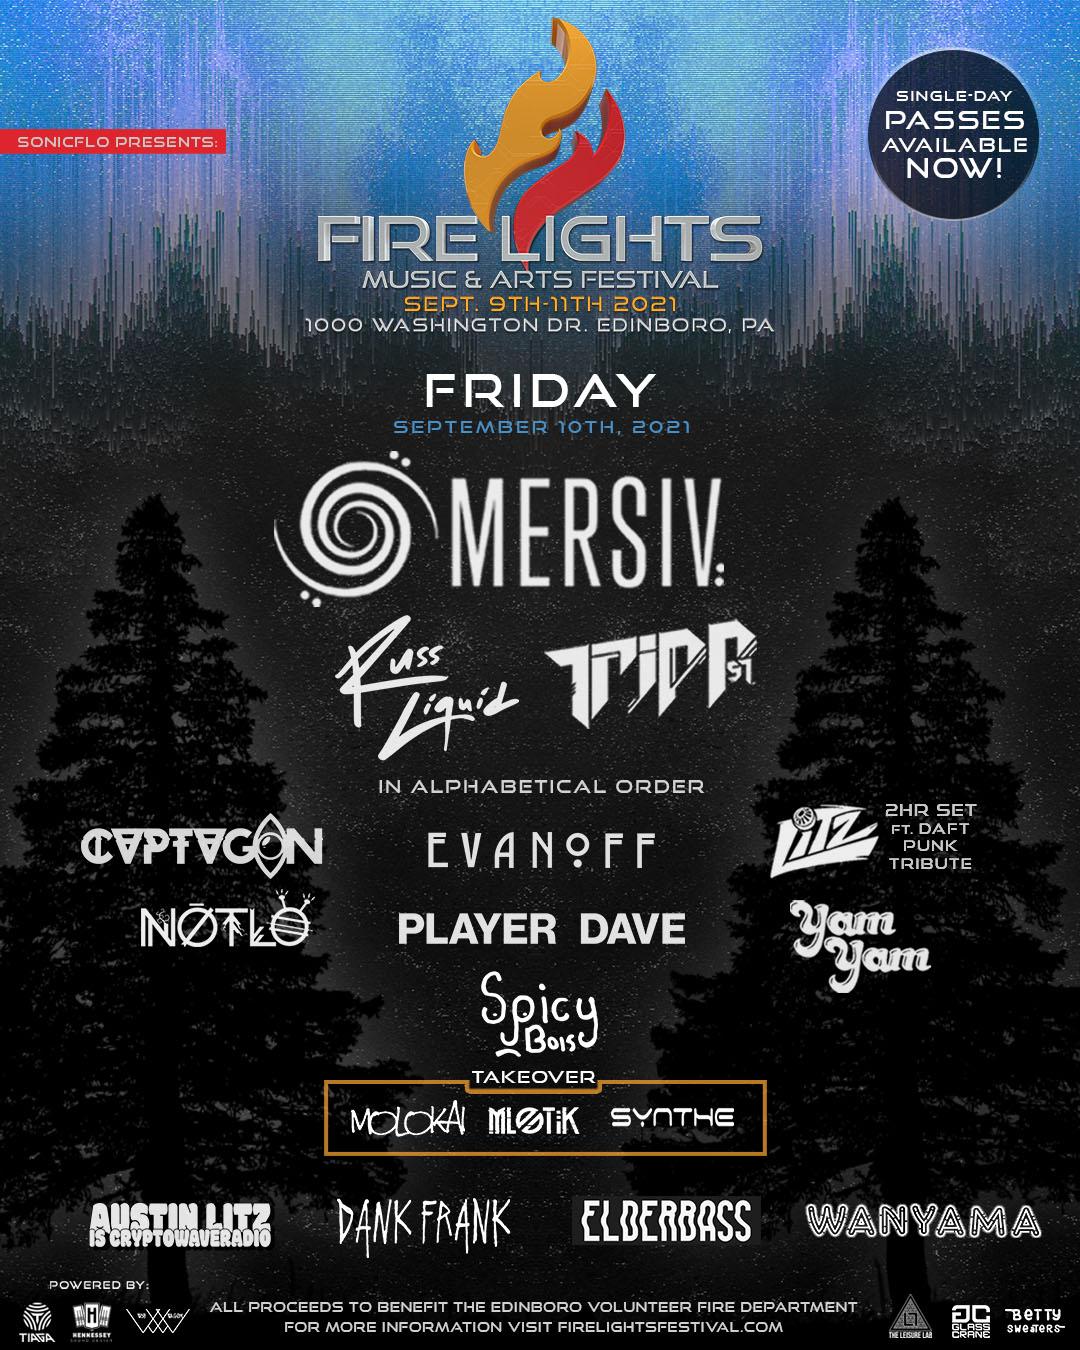 Fire Lights Friday